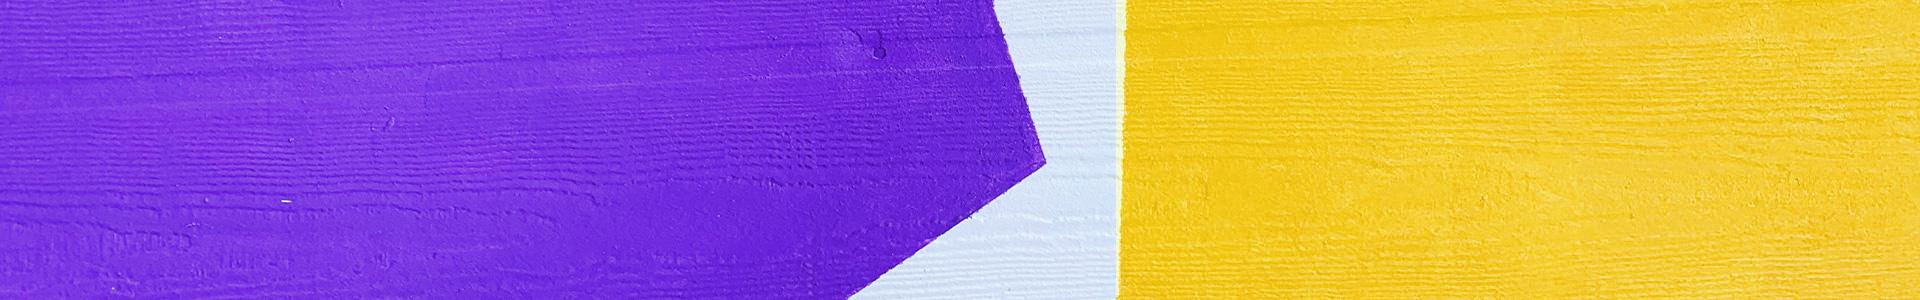 Intersex - Wavelength LGBTI Medical Education image